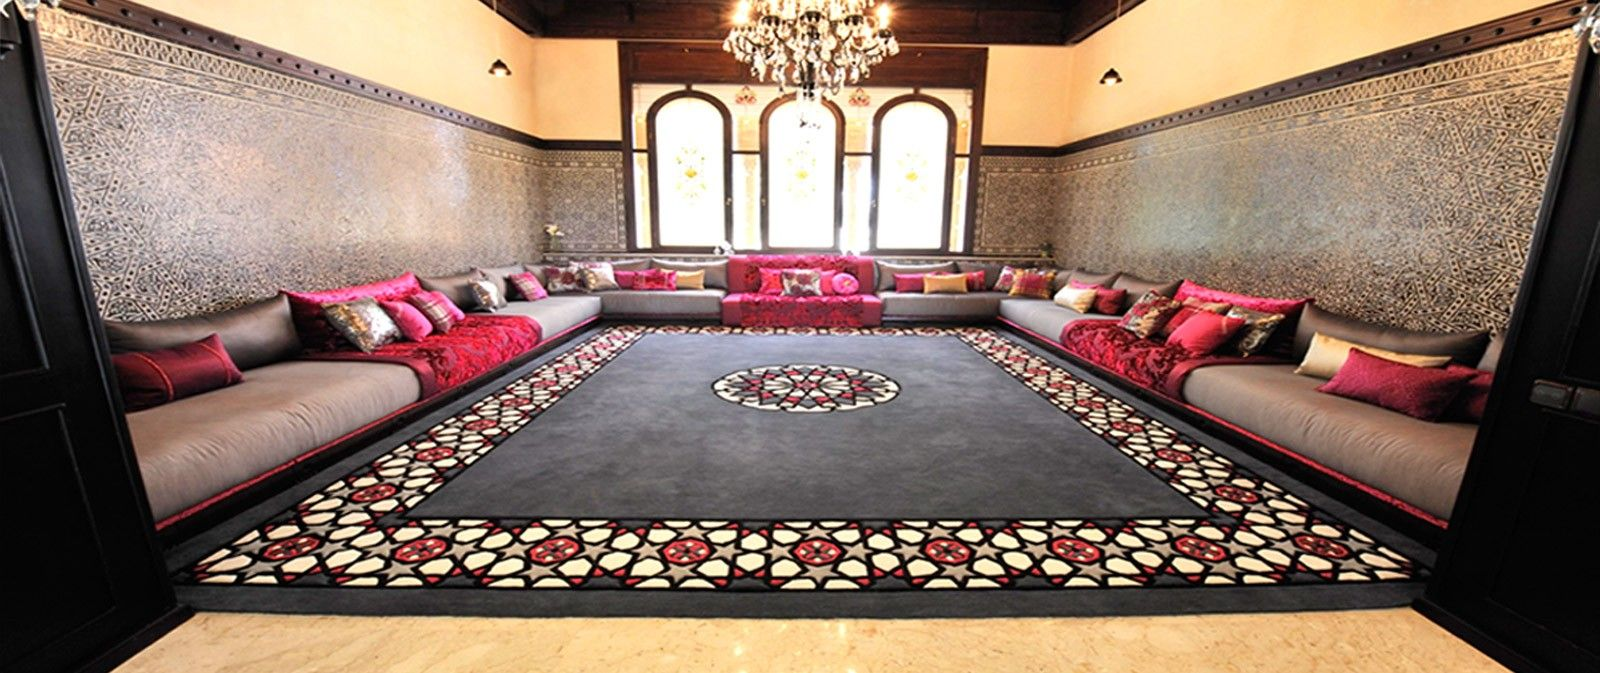 Salon Marocain Maroc Prix tapis pour salon marocain moderne | enredada